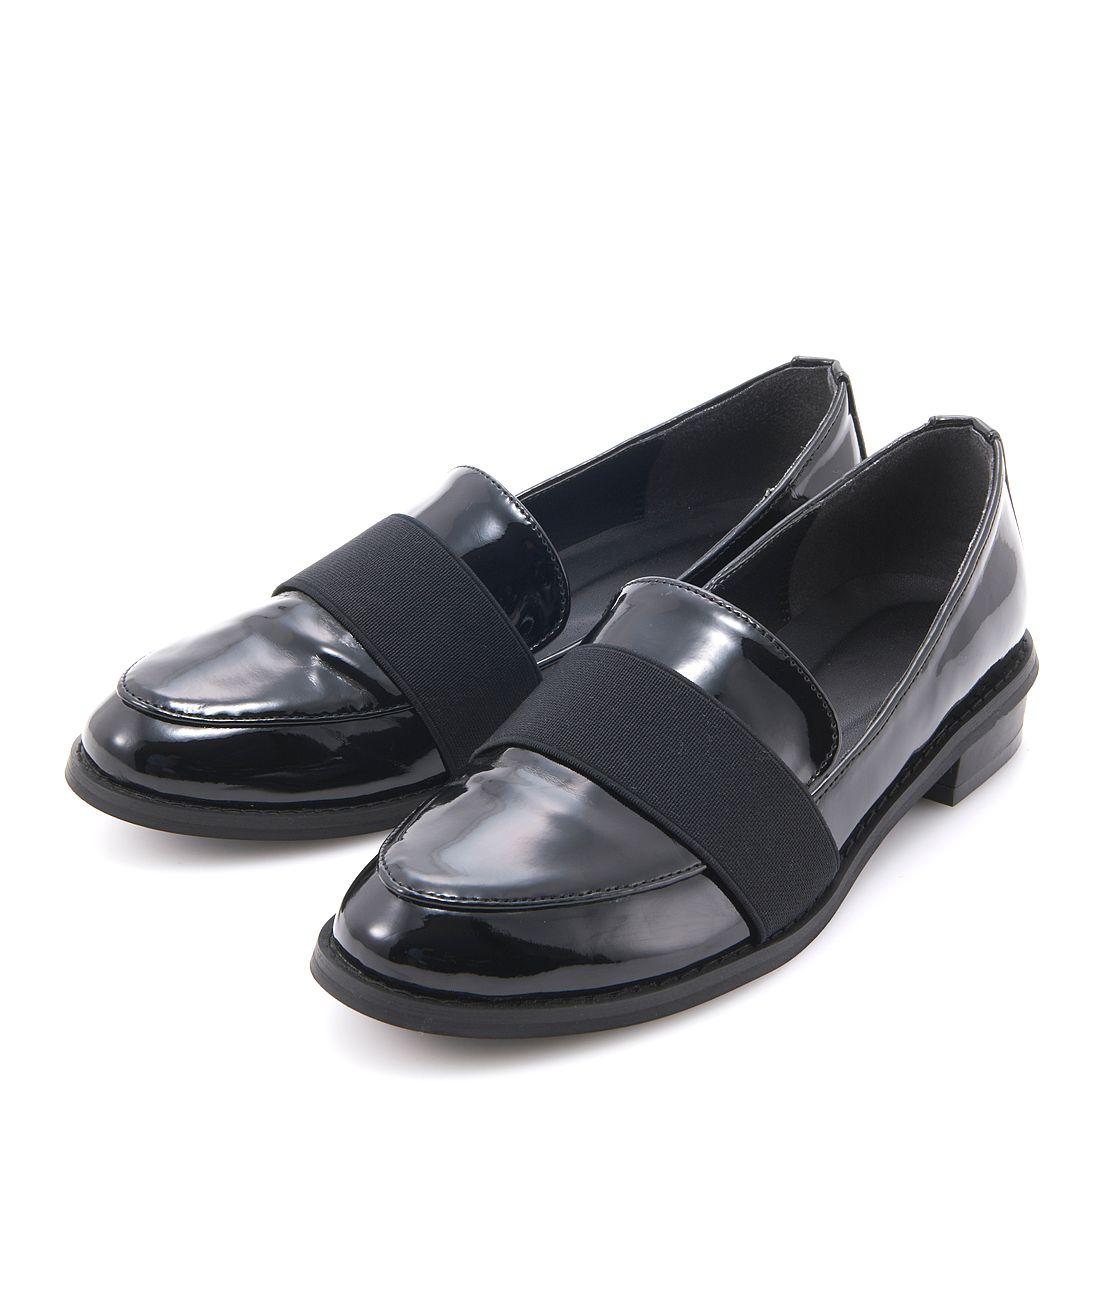 Elastic belts shoes